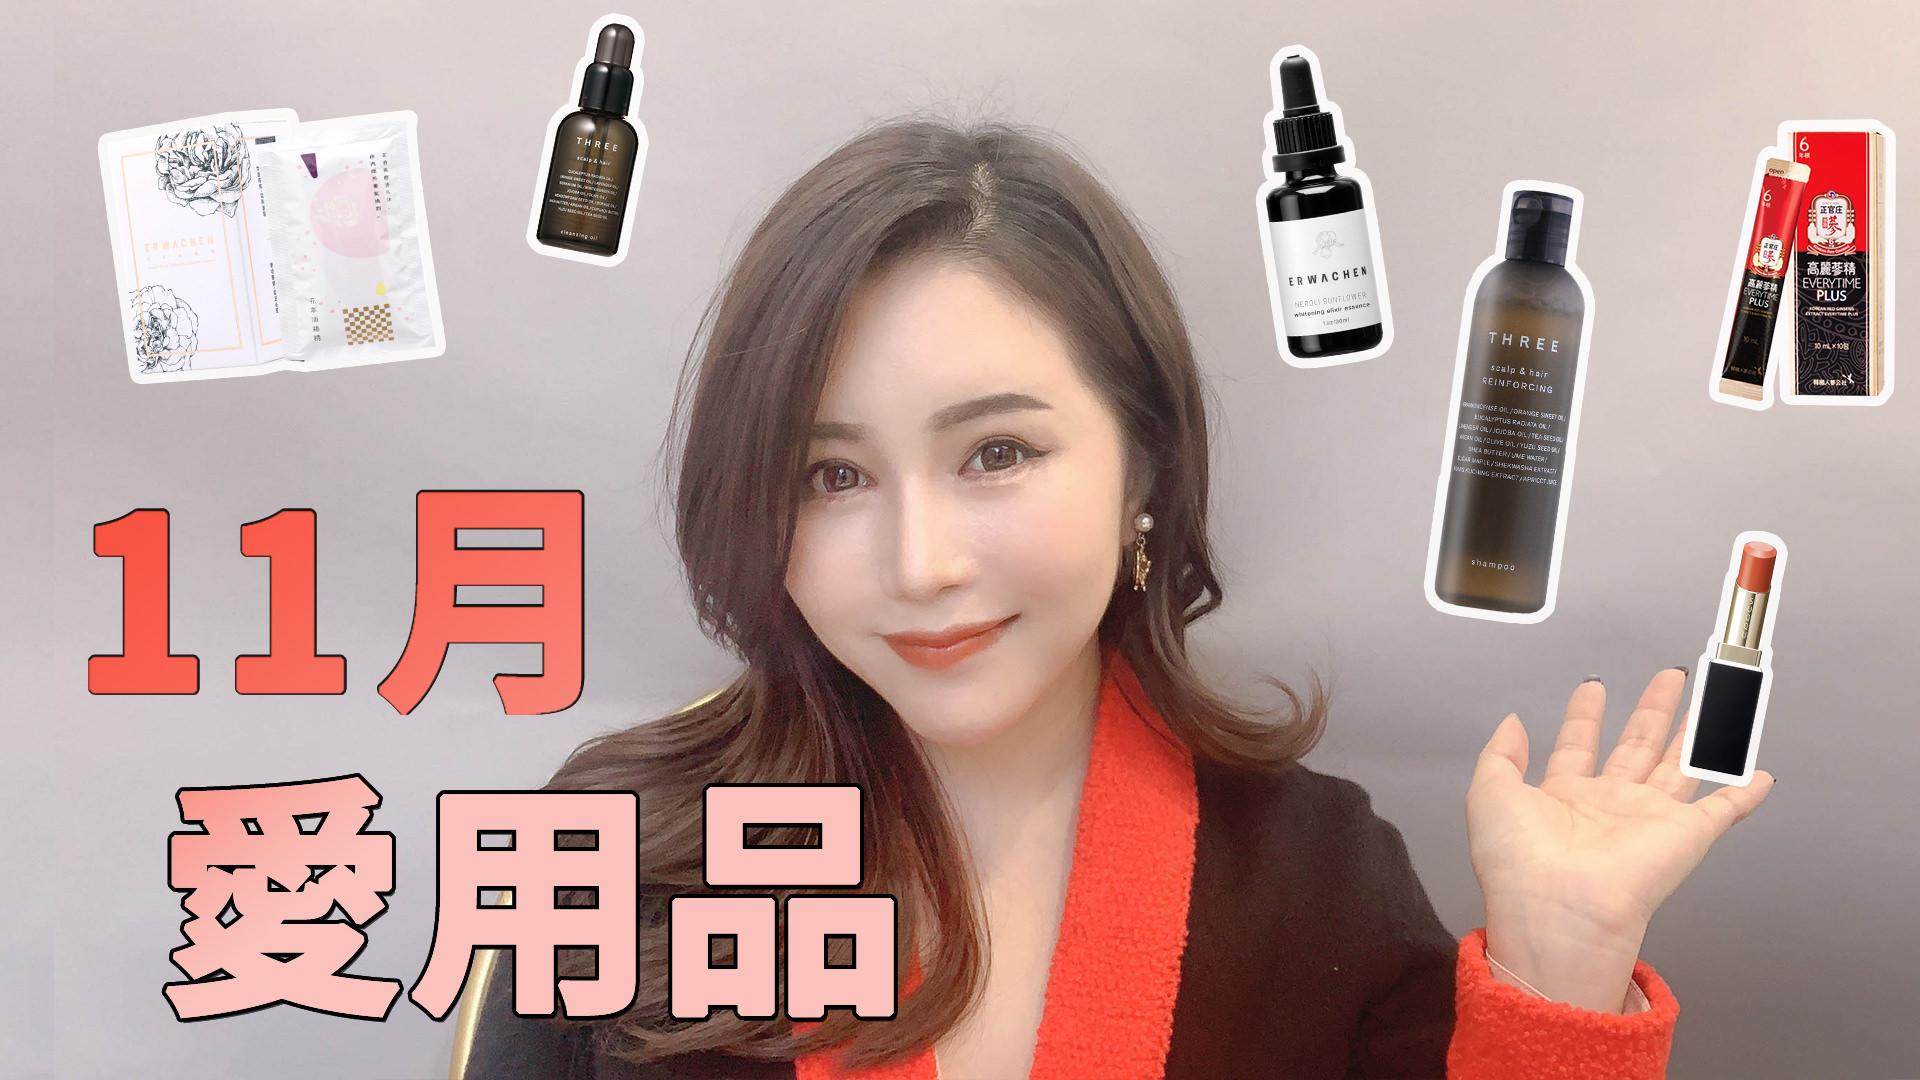 [YOUTUBE] 11月愛用品:保養品 / 彩妝 / 健康 /生活 / November Favorites | 2019 IGisele